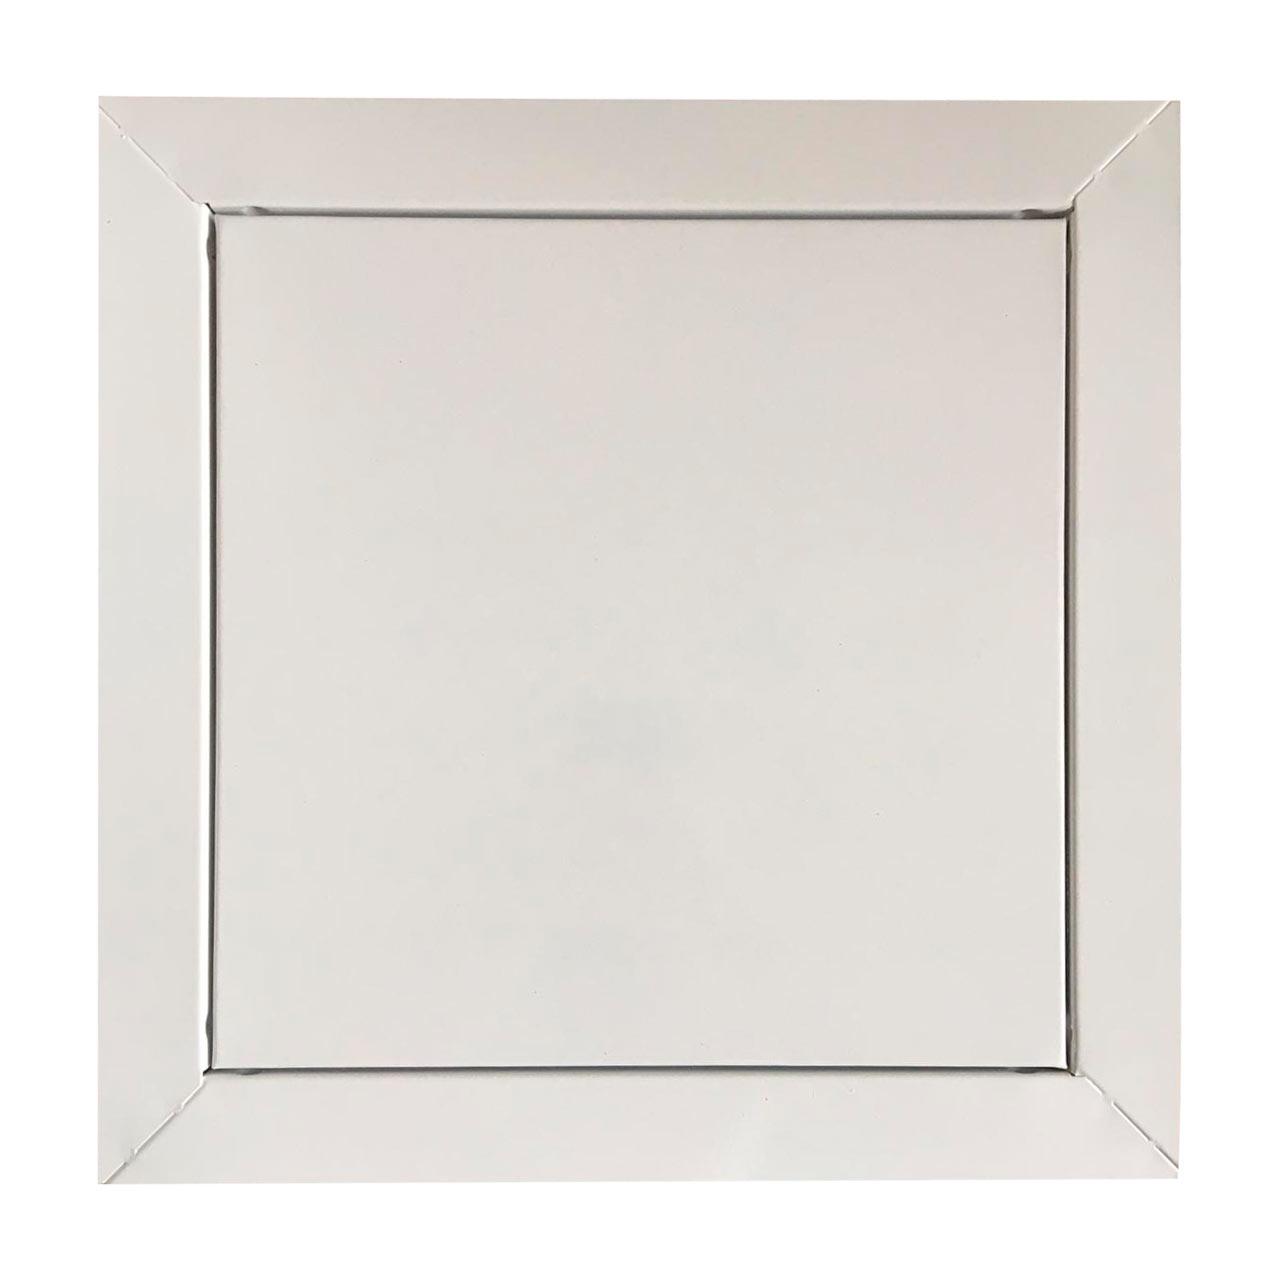 Alçapão 30x30cm c/ tampa metálica p/ forro